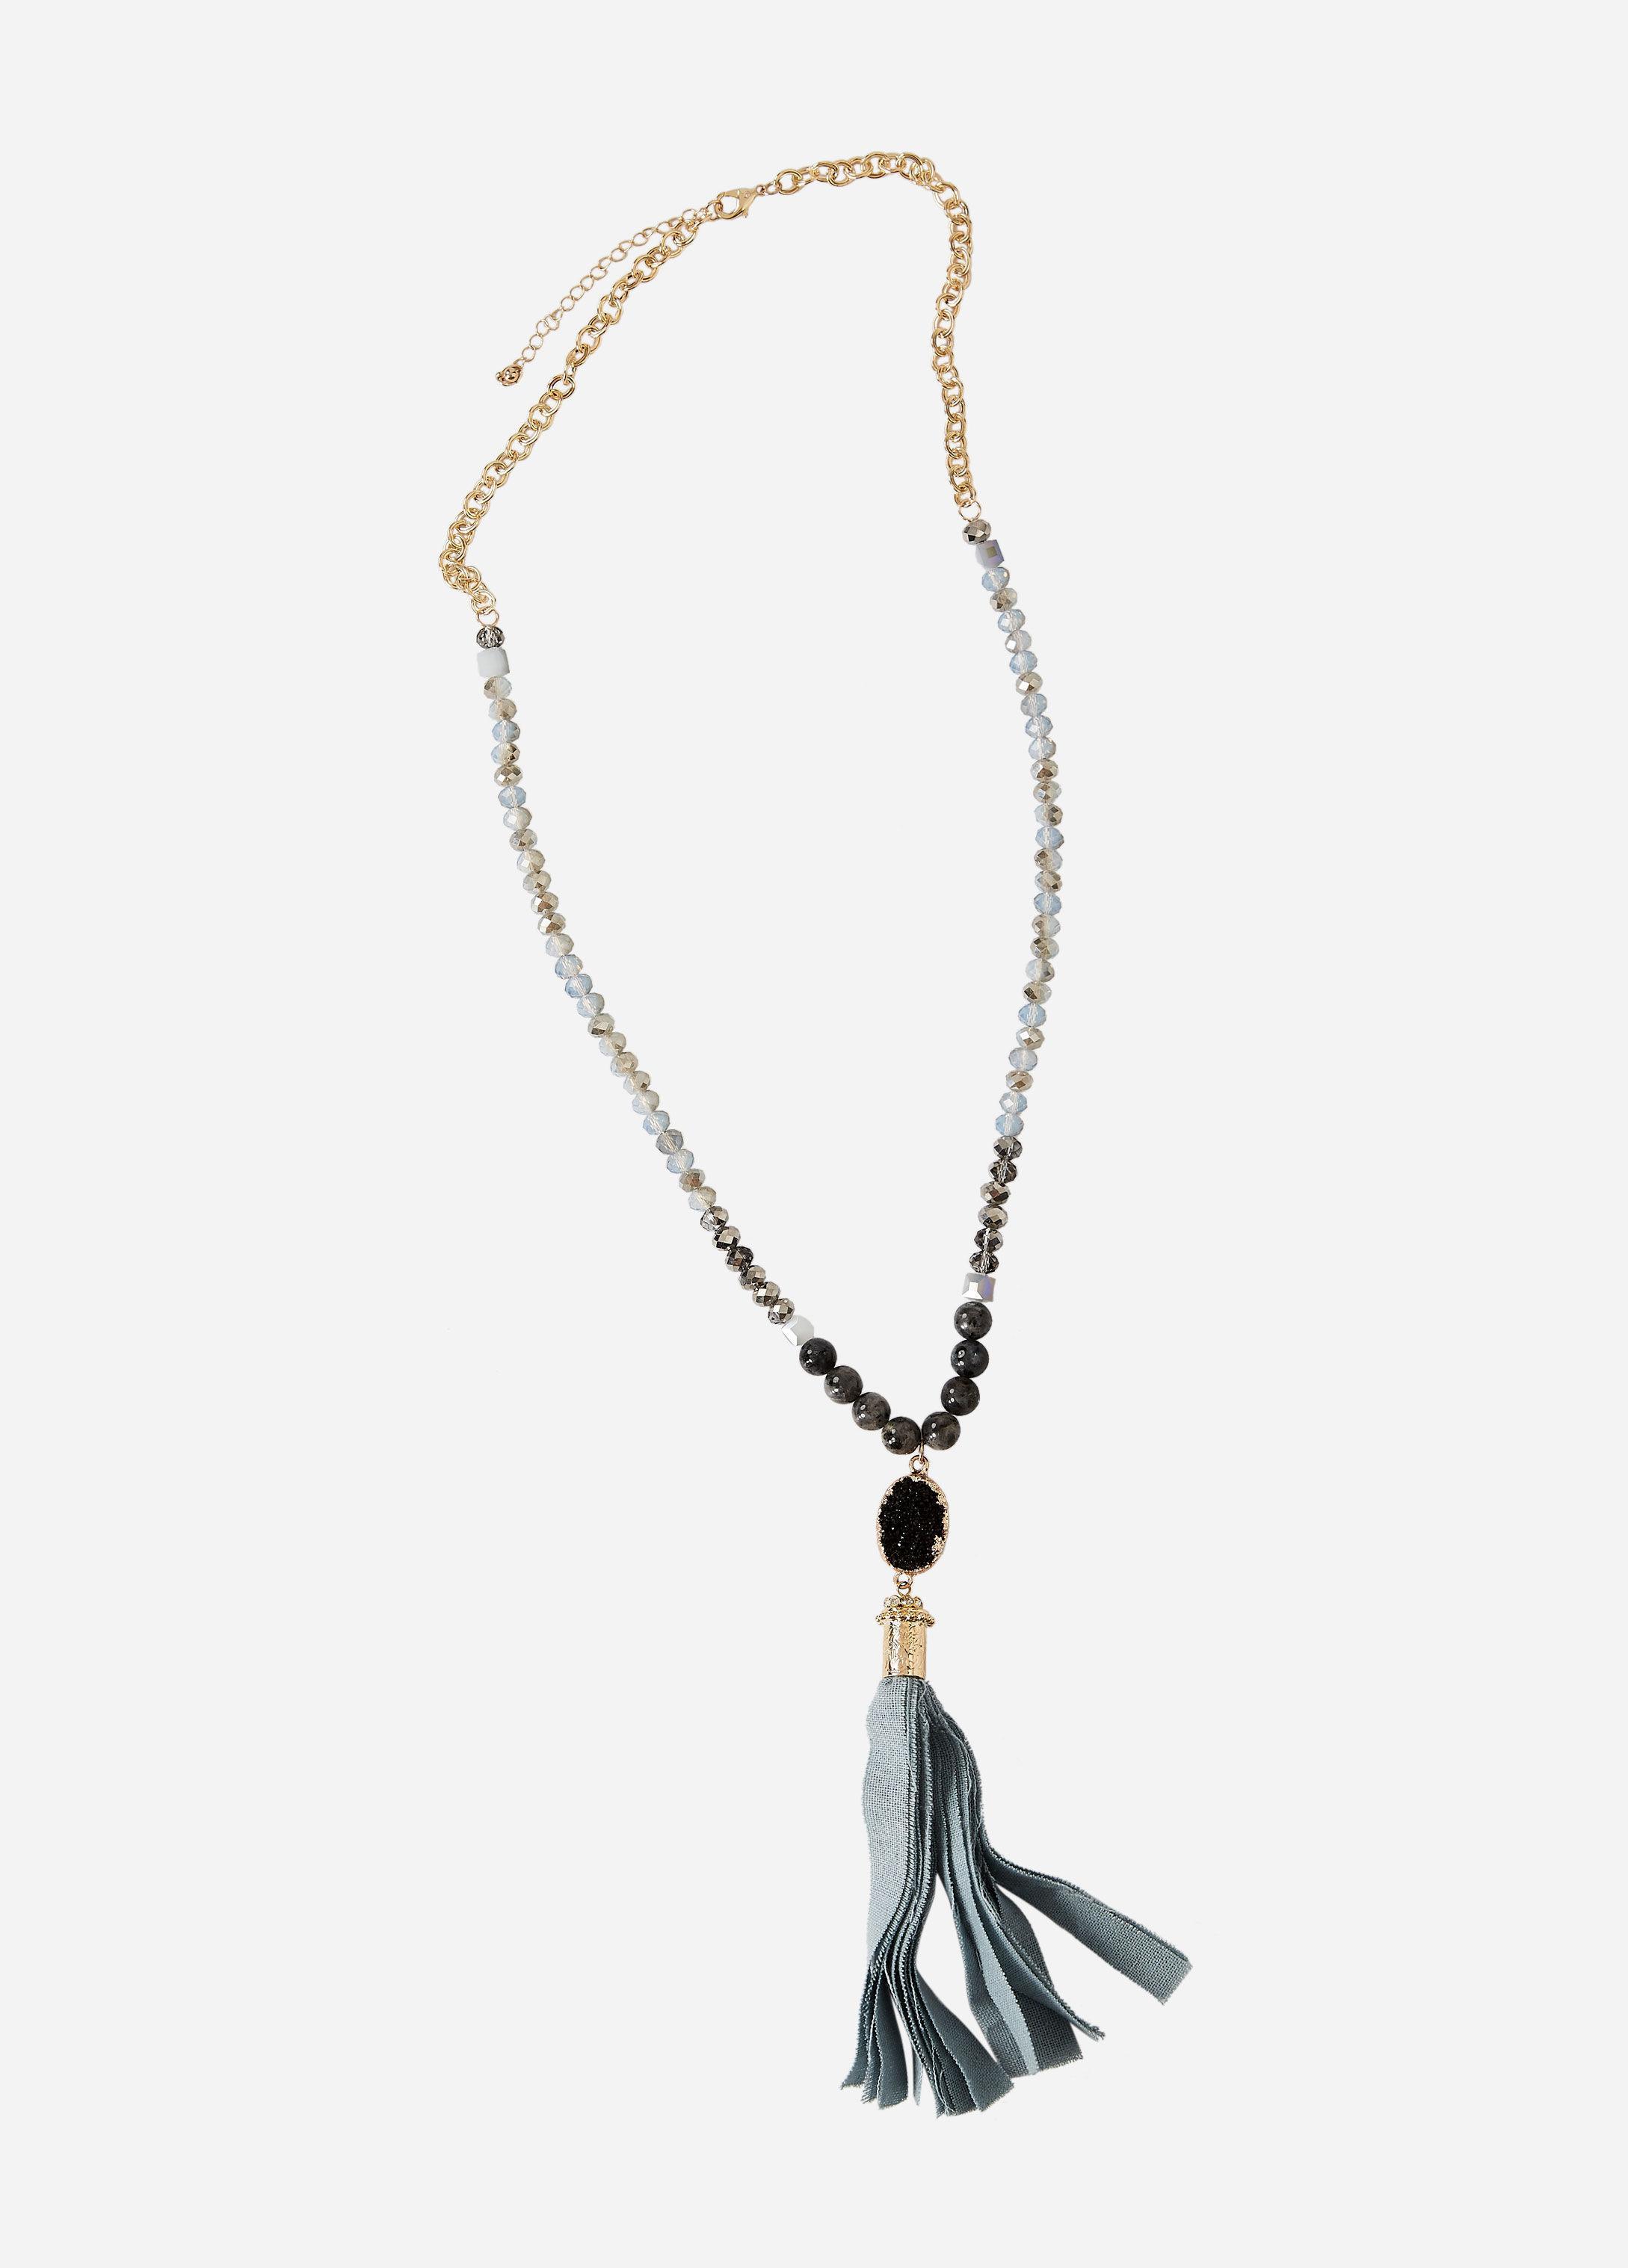 Ashley Stewart Druzy Beaded Gold Chain Necklace etPnbXM